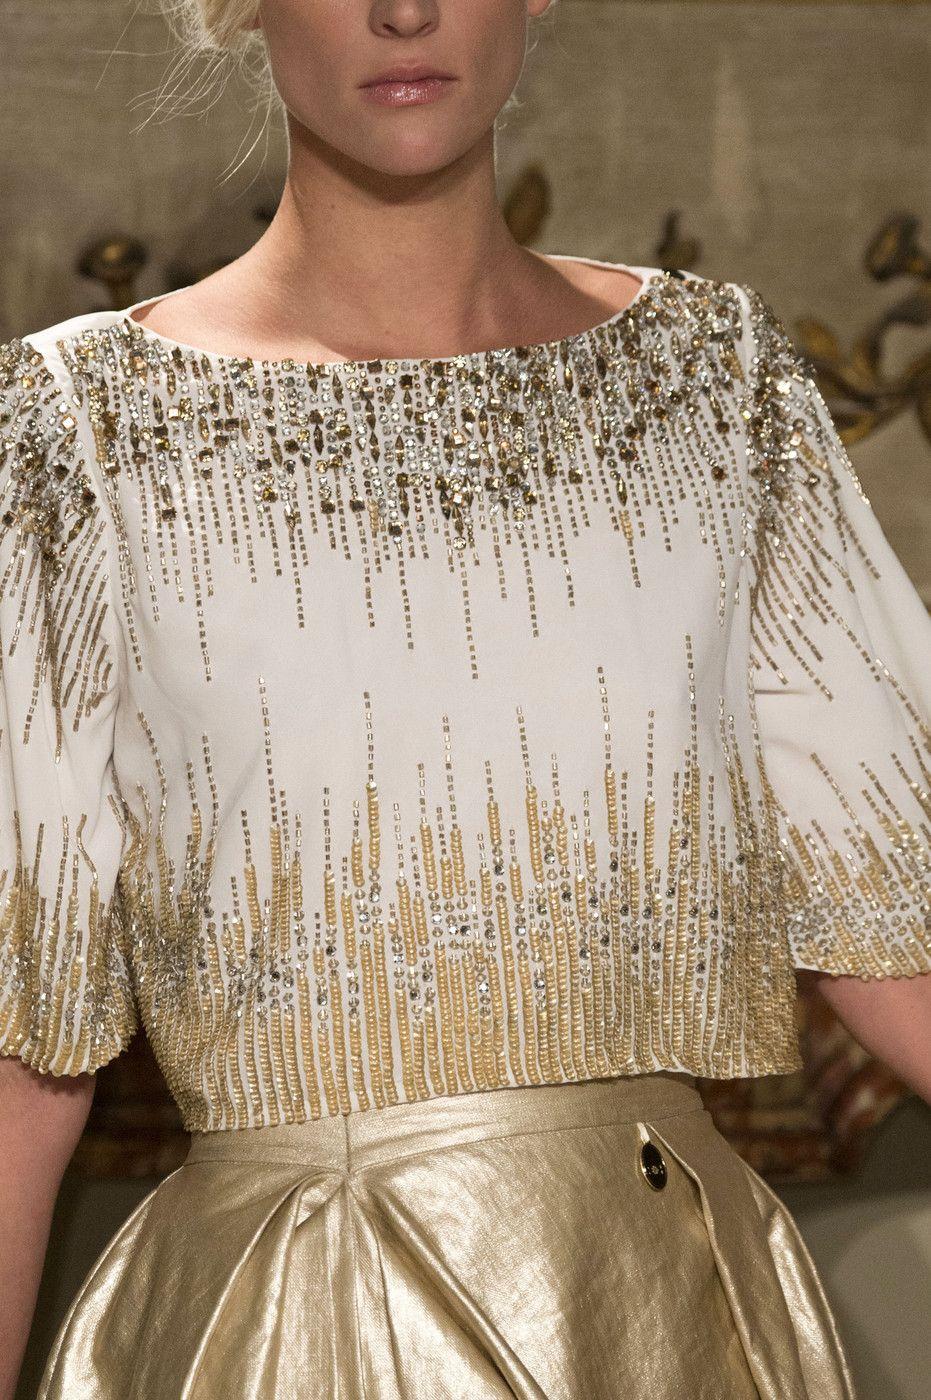 fashionsprose:  Details at Elisabetta Franchi RTW S/S 2015  .